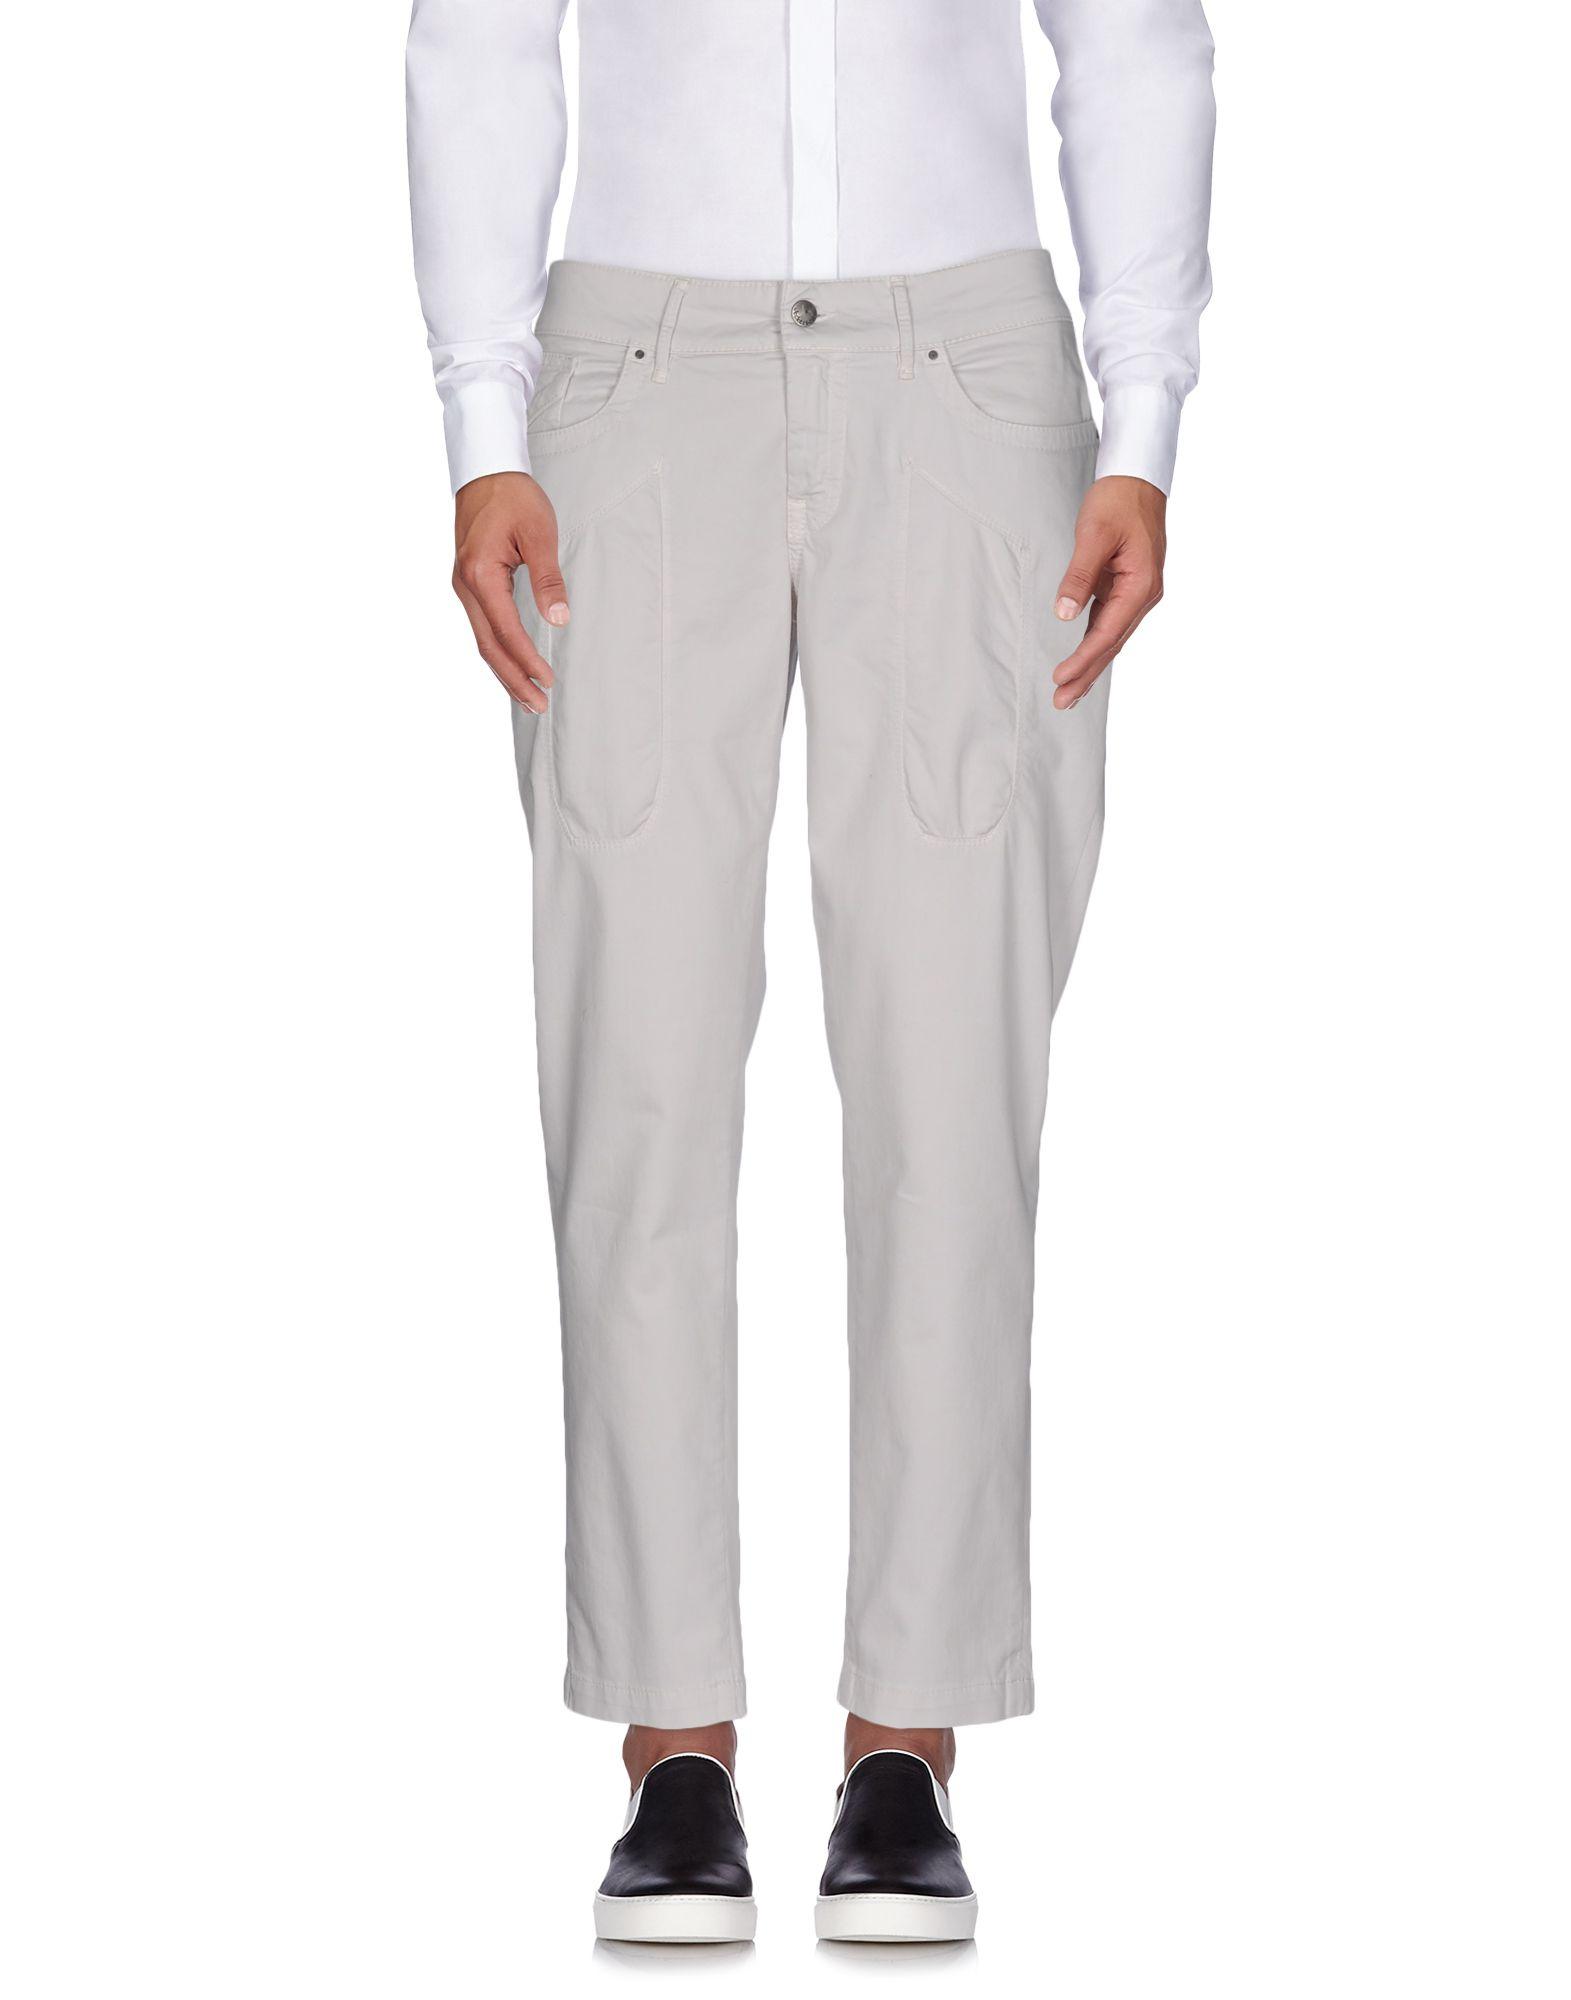 Pantalone Jeckerson uomo - - 36907966CC  Räumung sparen